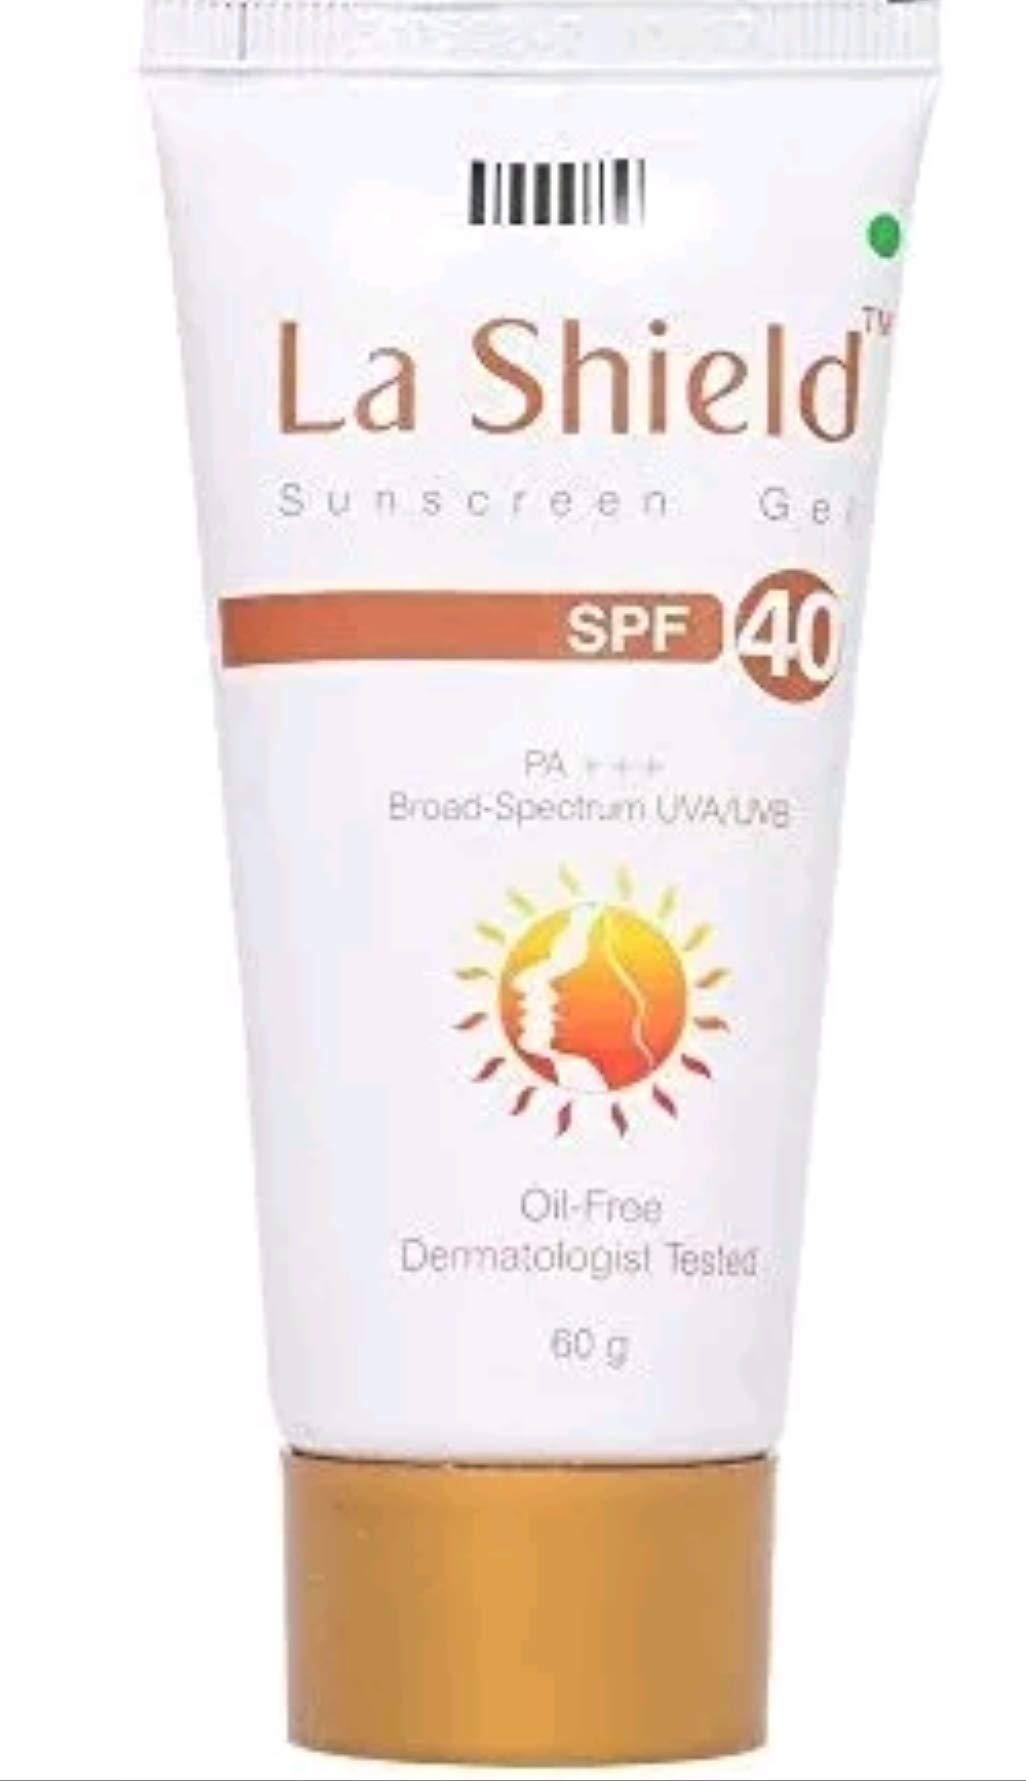 Glenmark La Shield Sunscreen Gel SPF 40, PA+++,Broad-Spectrum UVA/UVB Oil Free and Dermatologist Tested, 60gms product image